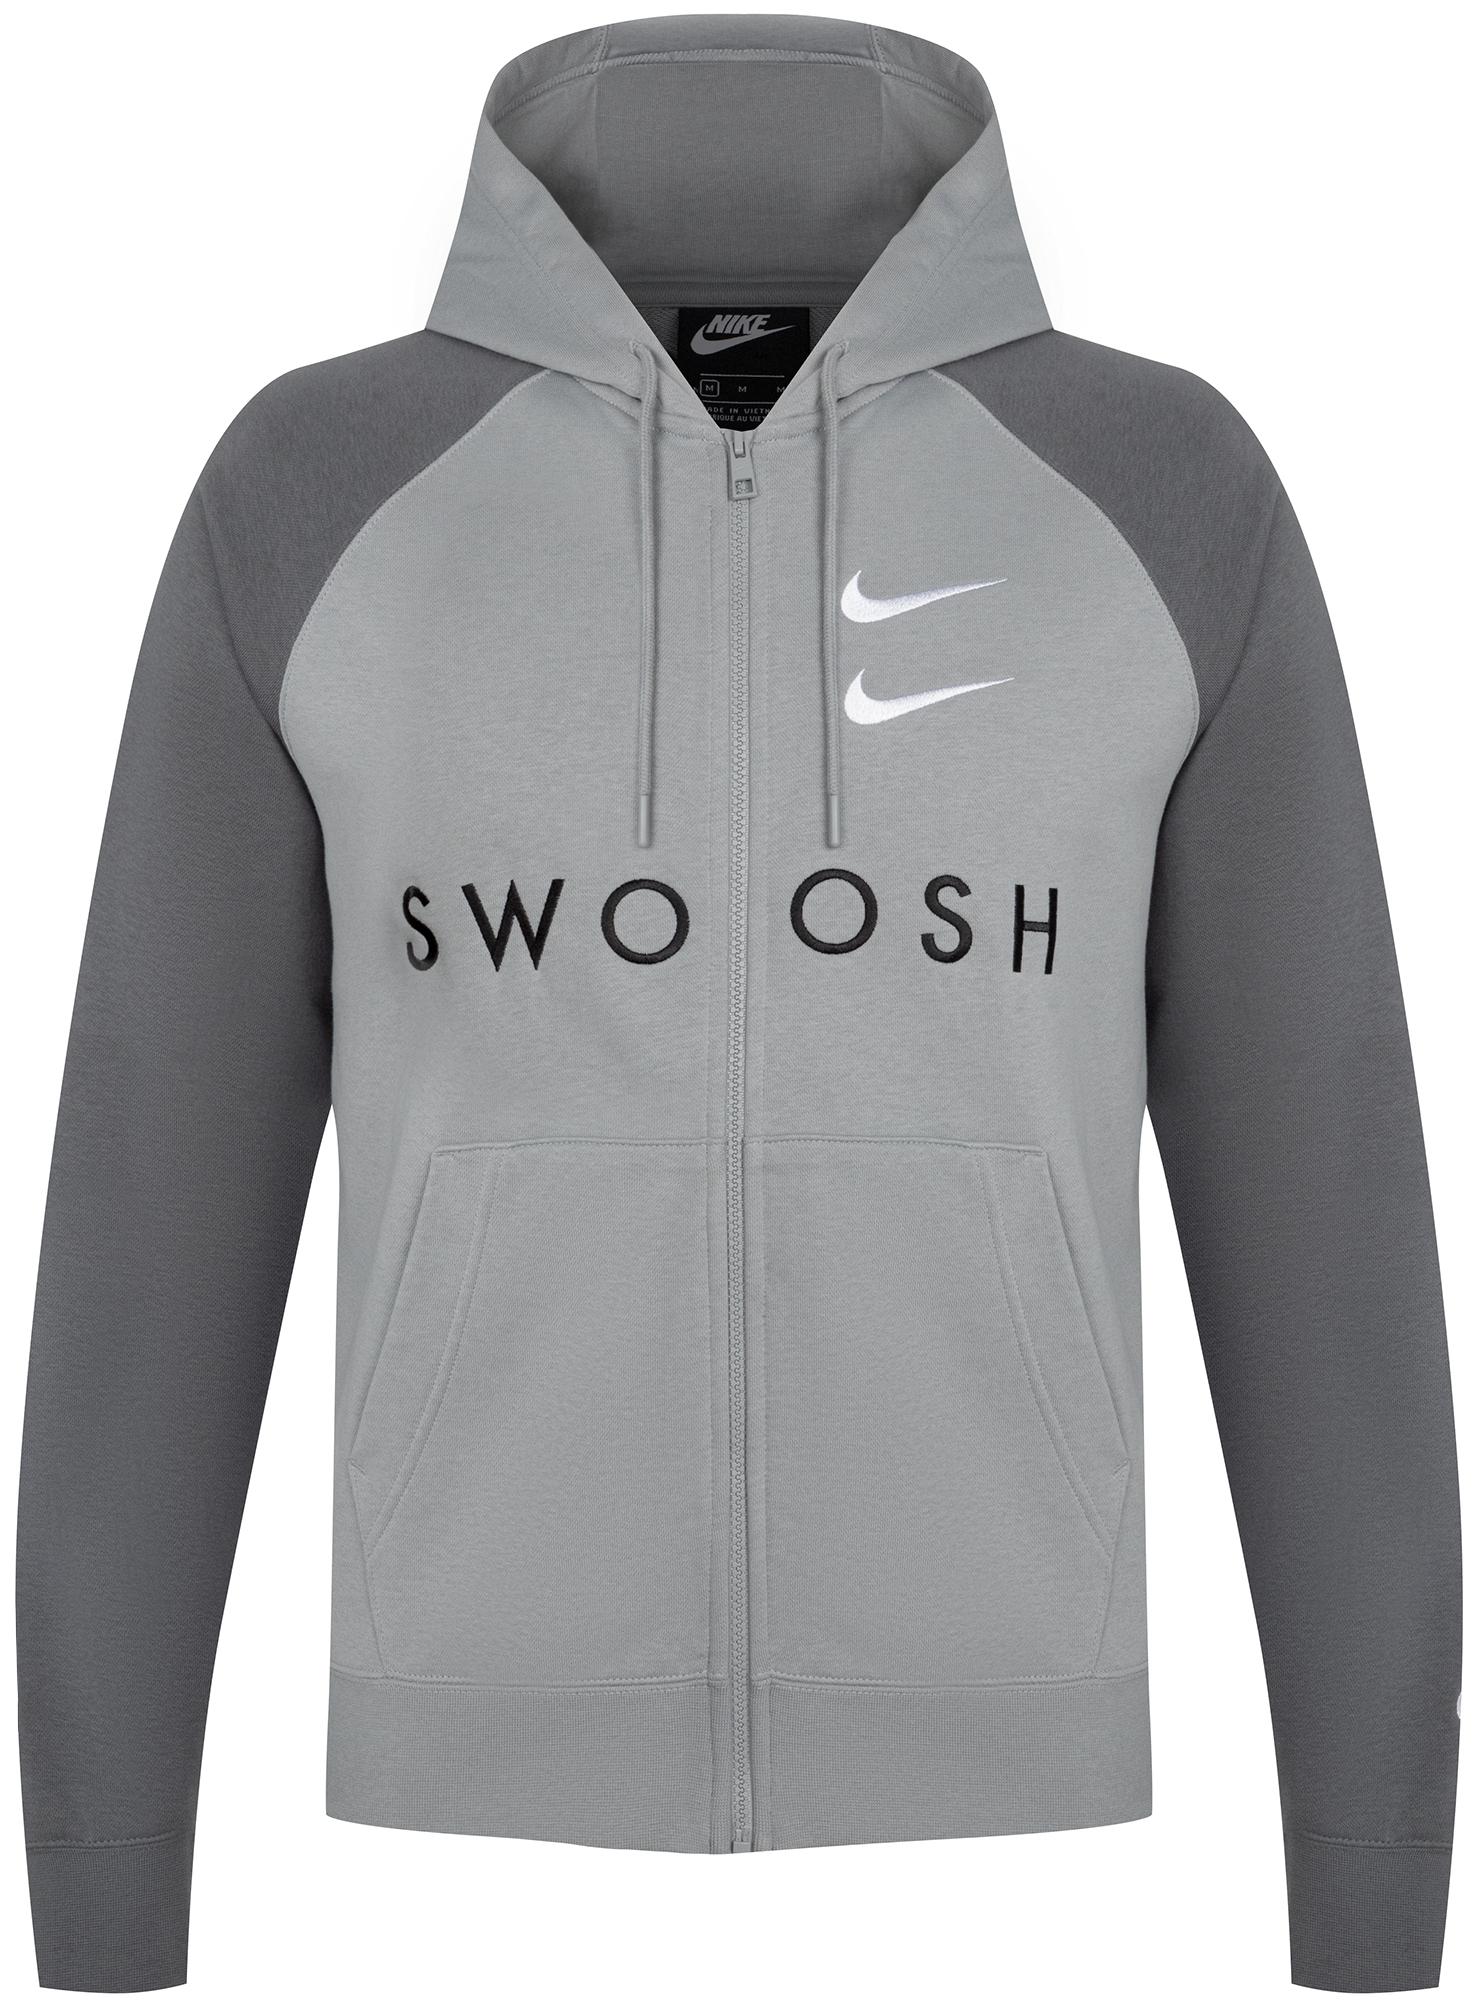 цена Nike Толстовка мужская Nike Sportswear Swoosh, размер 50-52 онлайн в 2017 году